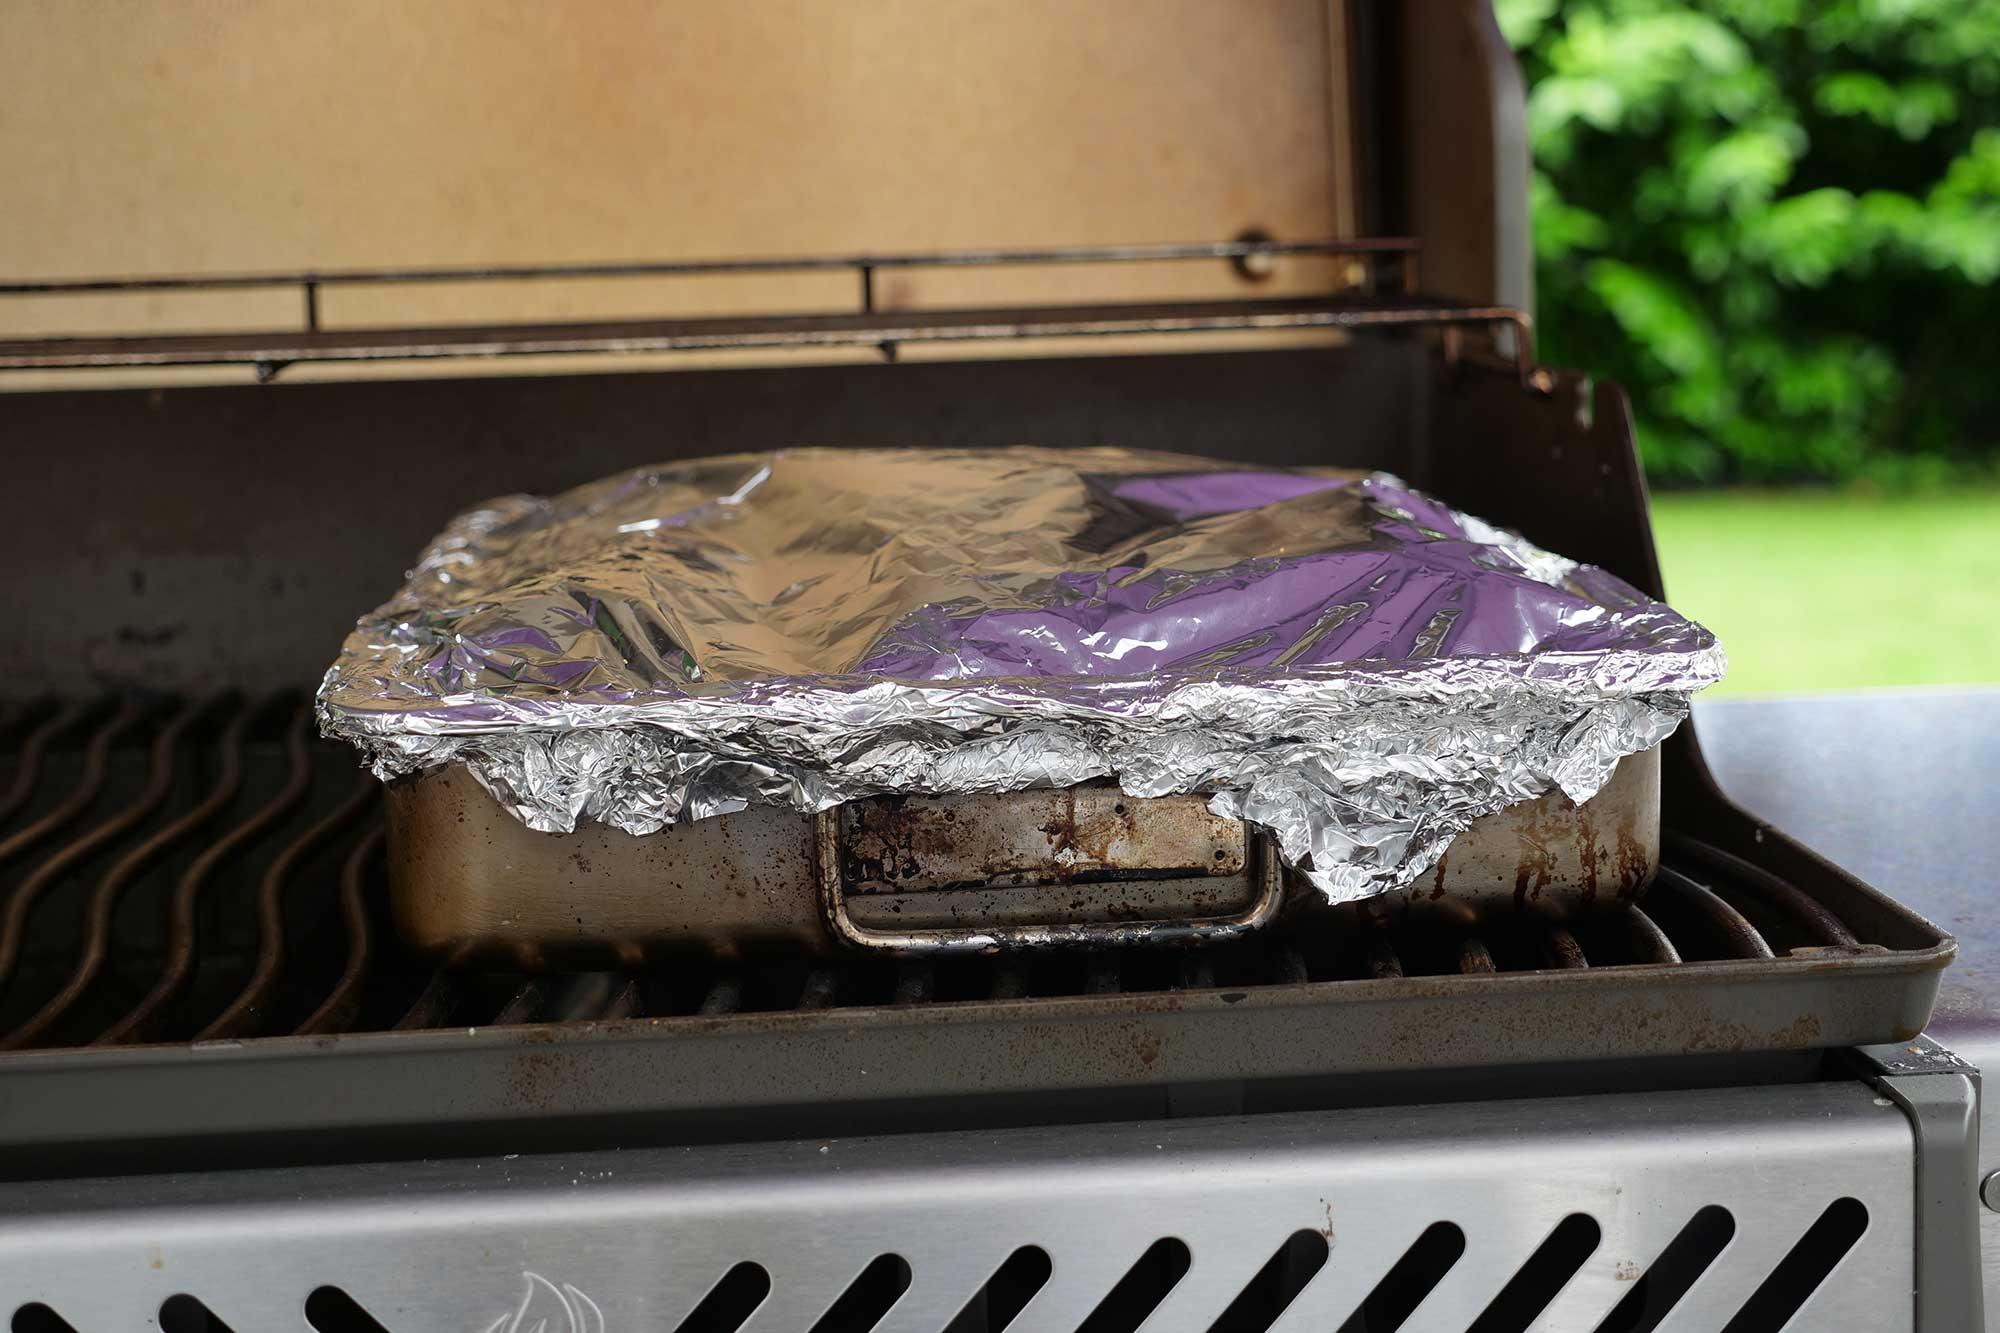 Kalbs Spareribs Gasgrill : Schnelle spareribs ribs in rekordzeit der wahnsinn